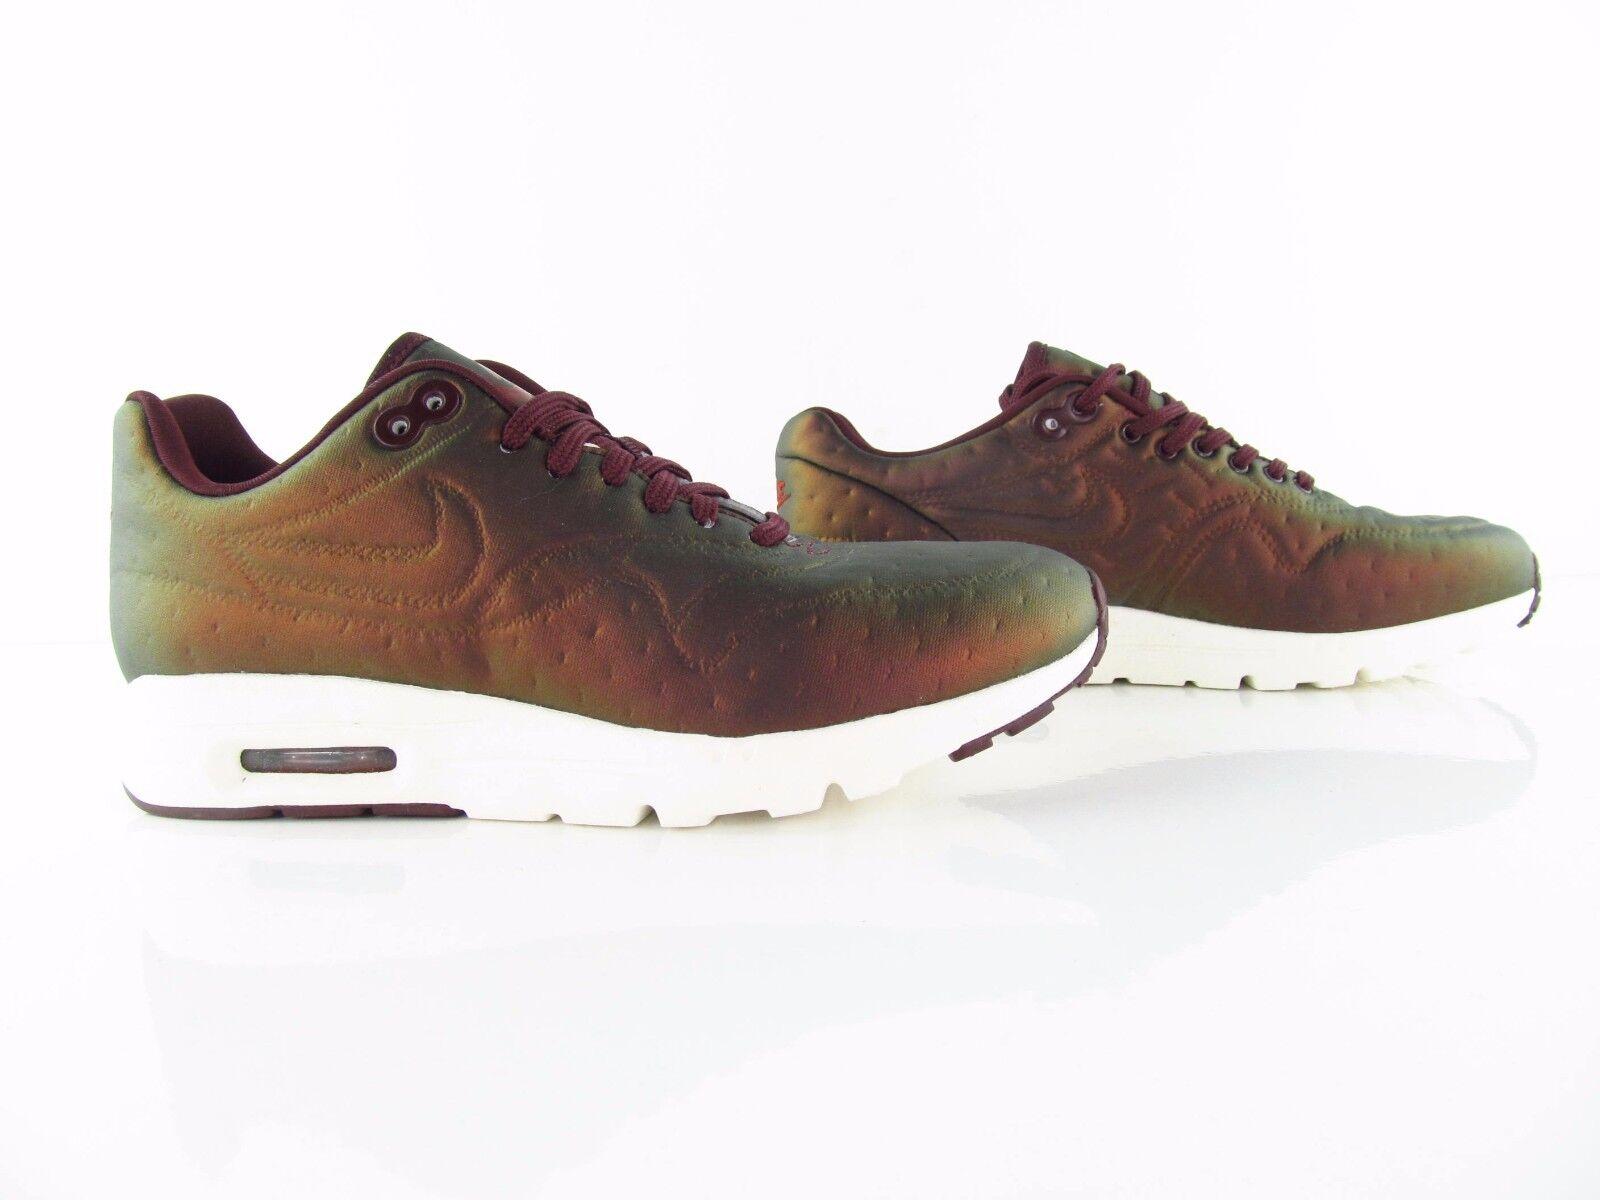 Nike Wmns Air Max 1 Ultra Premium Jacquard Metallic Mahogany US_7  Eur 38 best-selling model of the brand